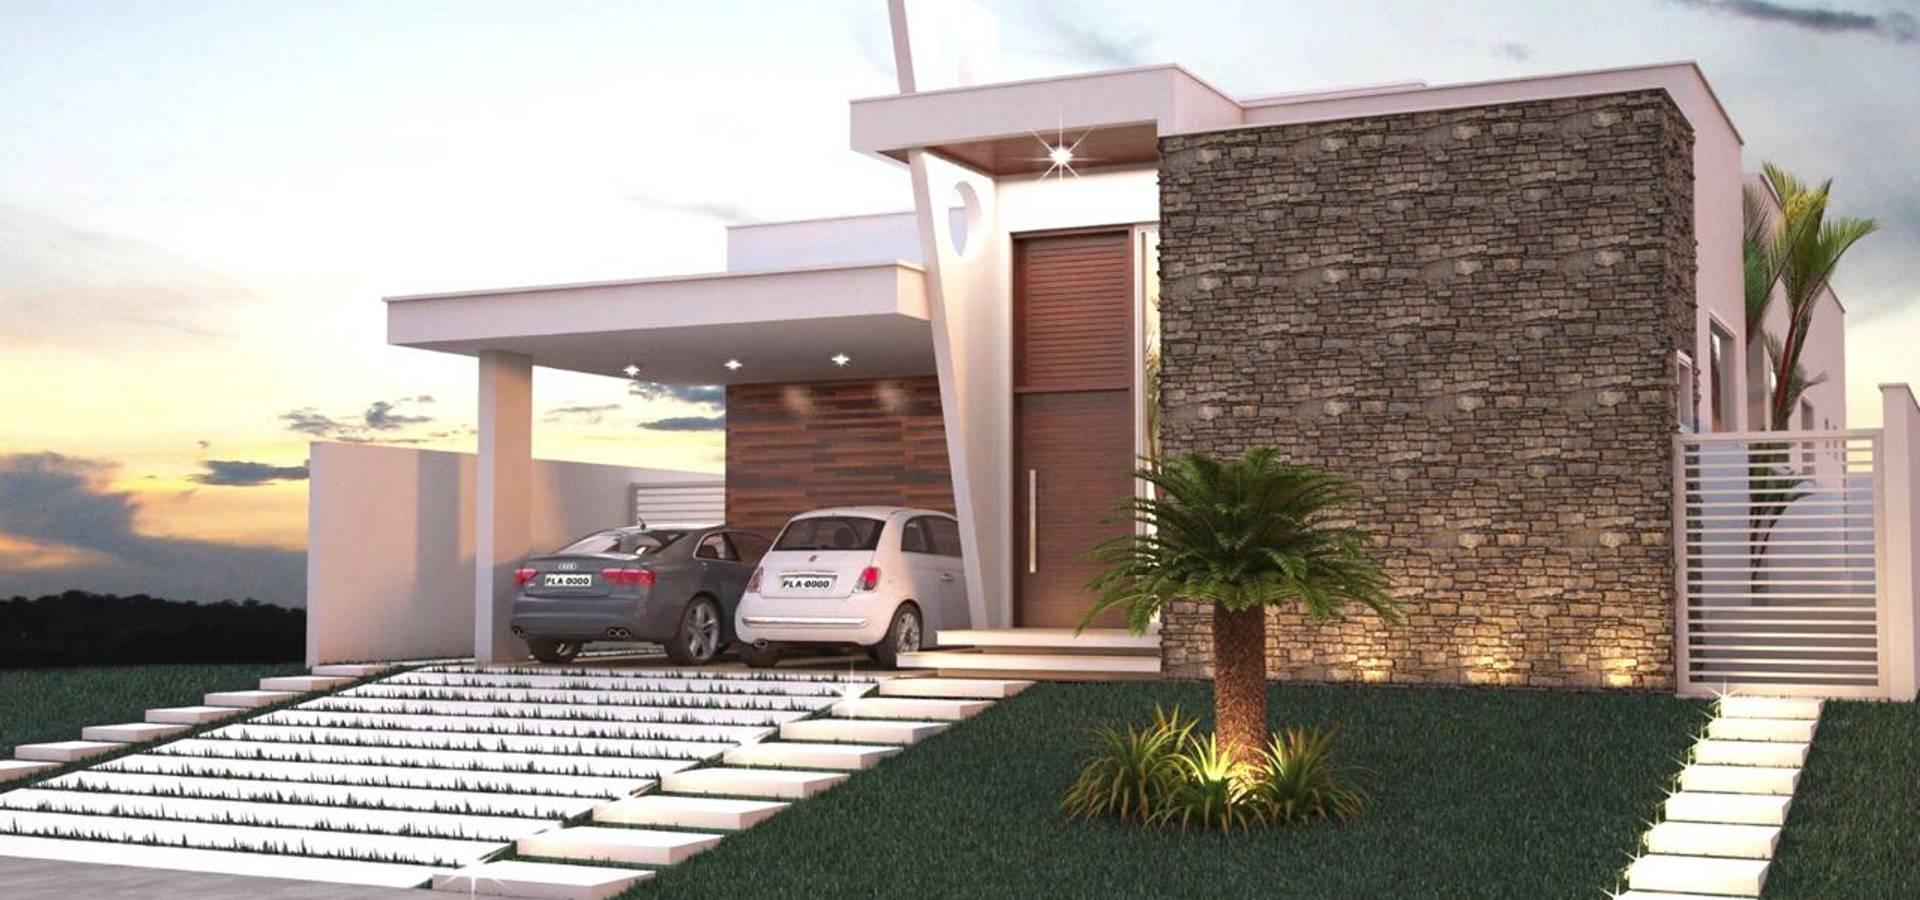 Jorge Martins Arquitetura